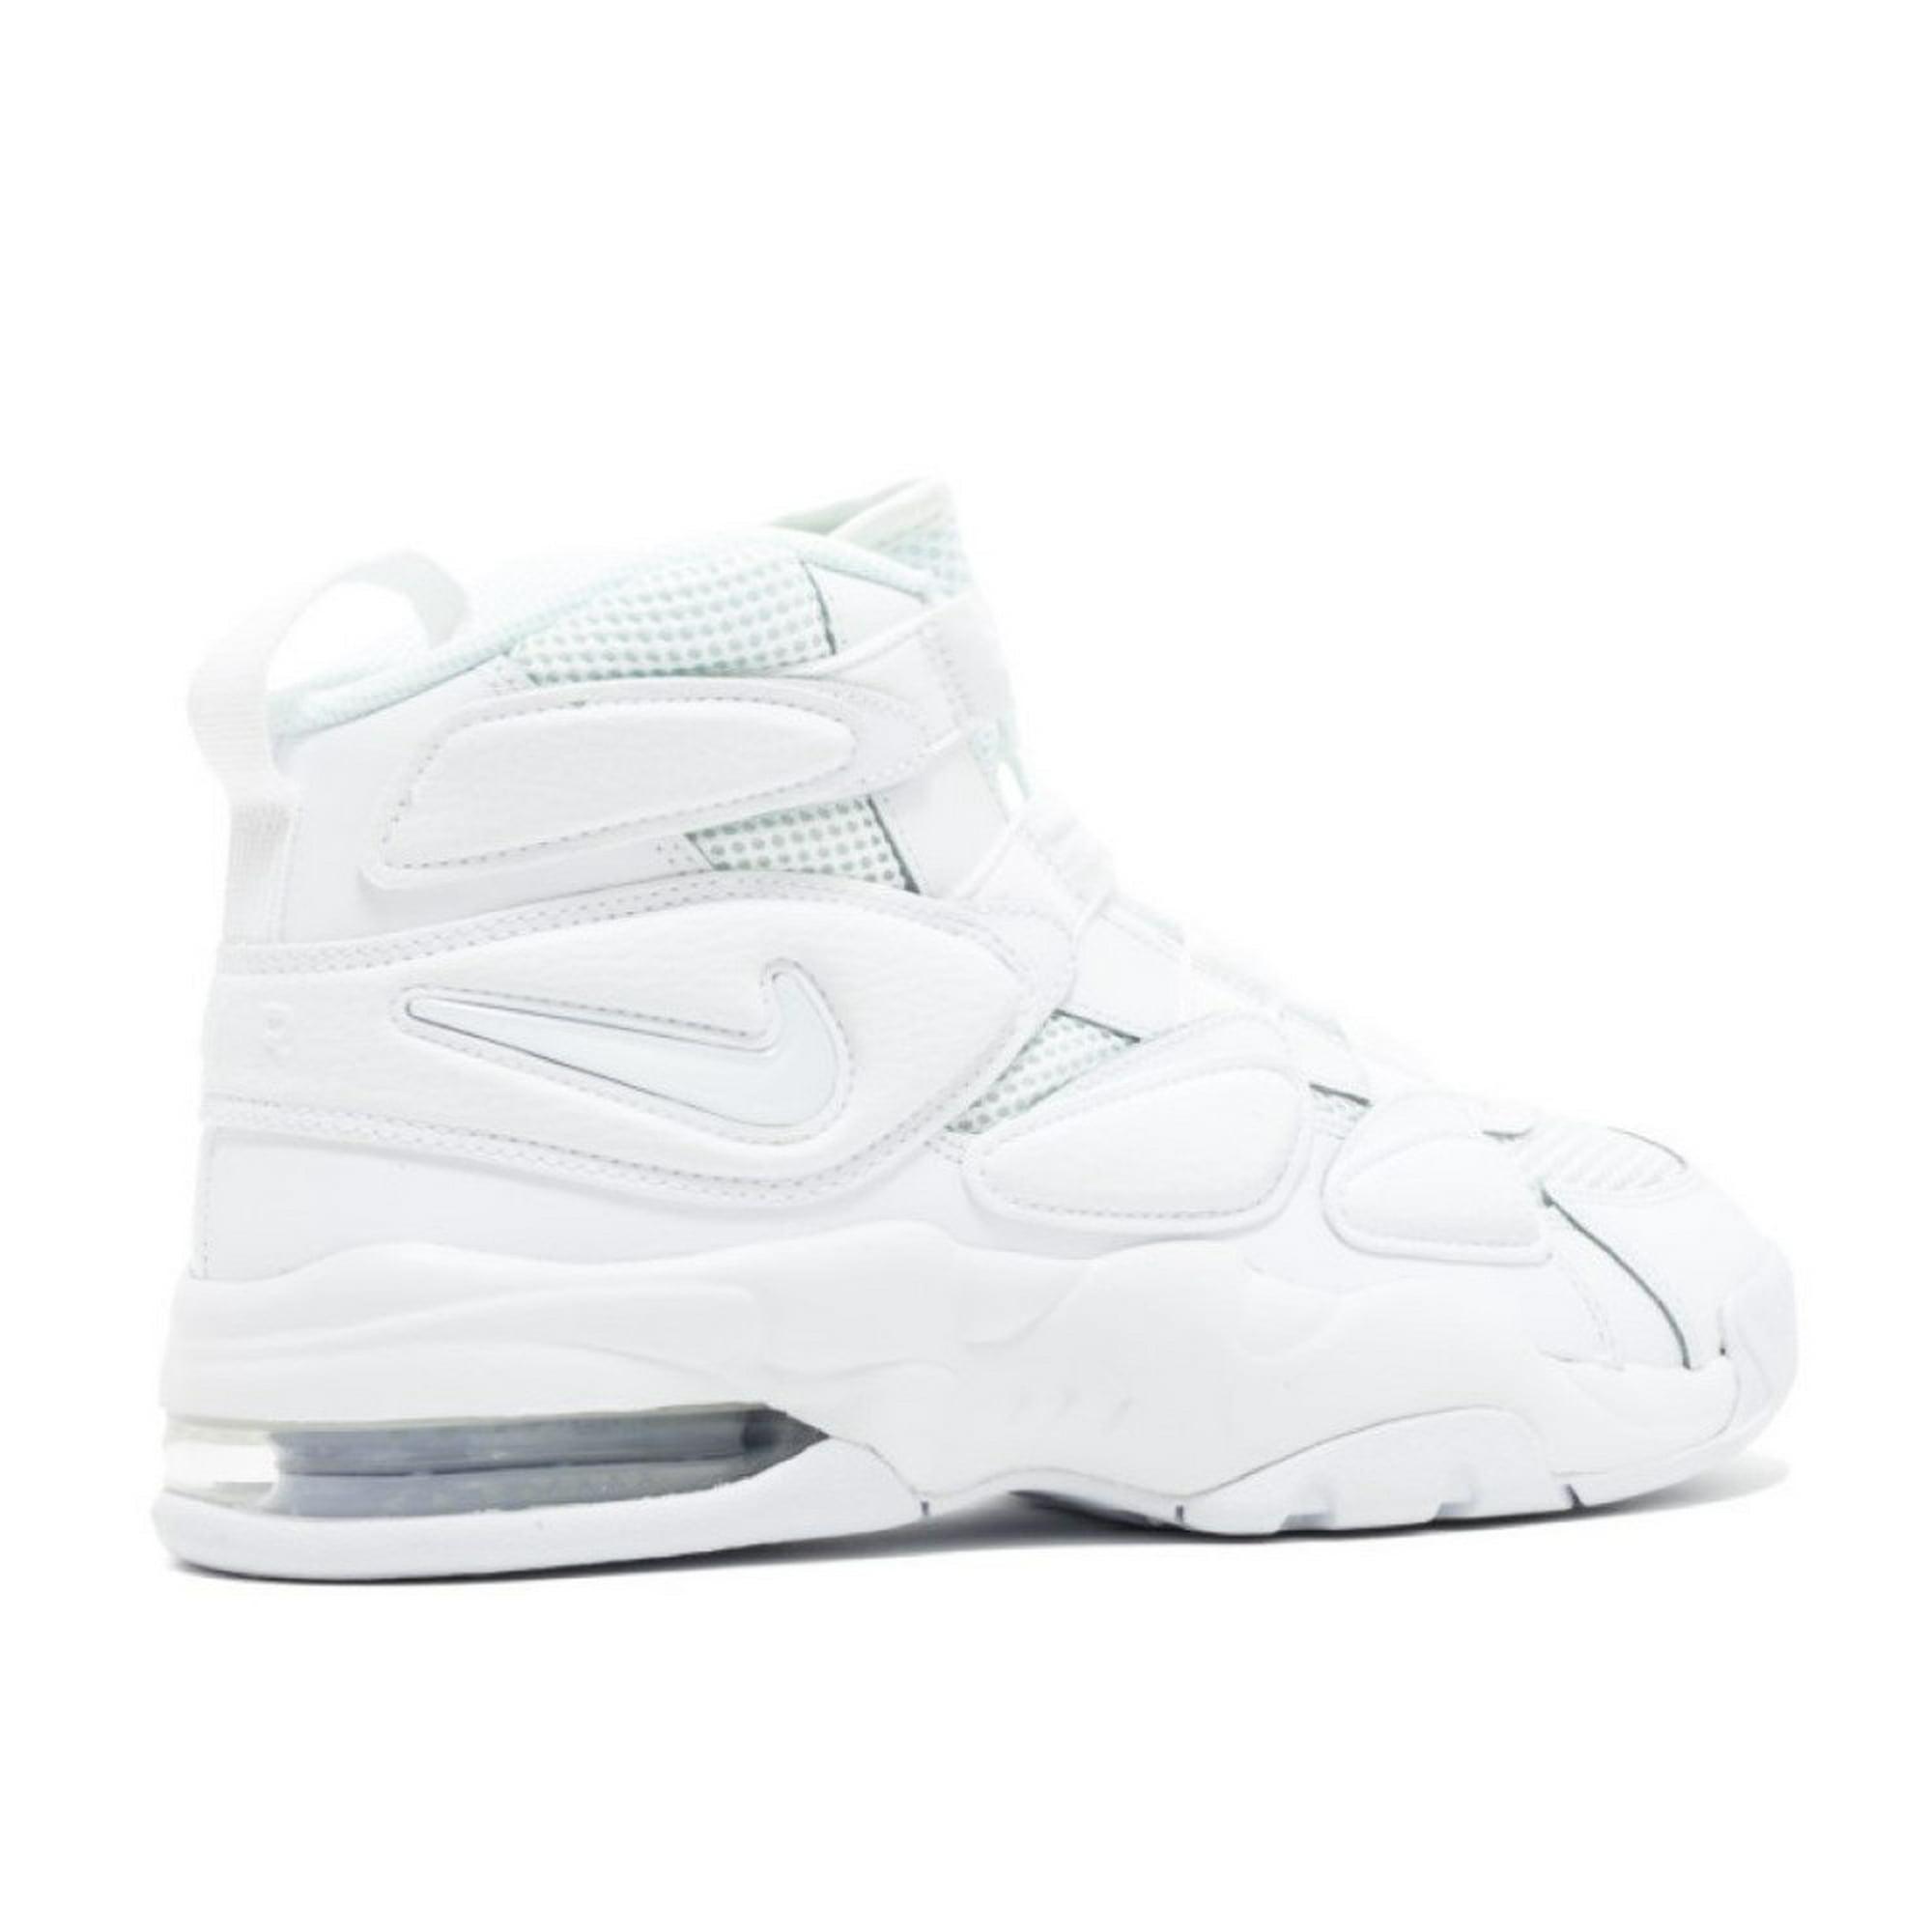 new york ecca9 79aac Nike - Men - Air Max2 Uptempo '94 'Triple White' - 922934-100 - Size 11.5 |  Walmart Canada